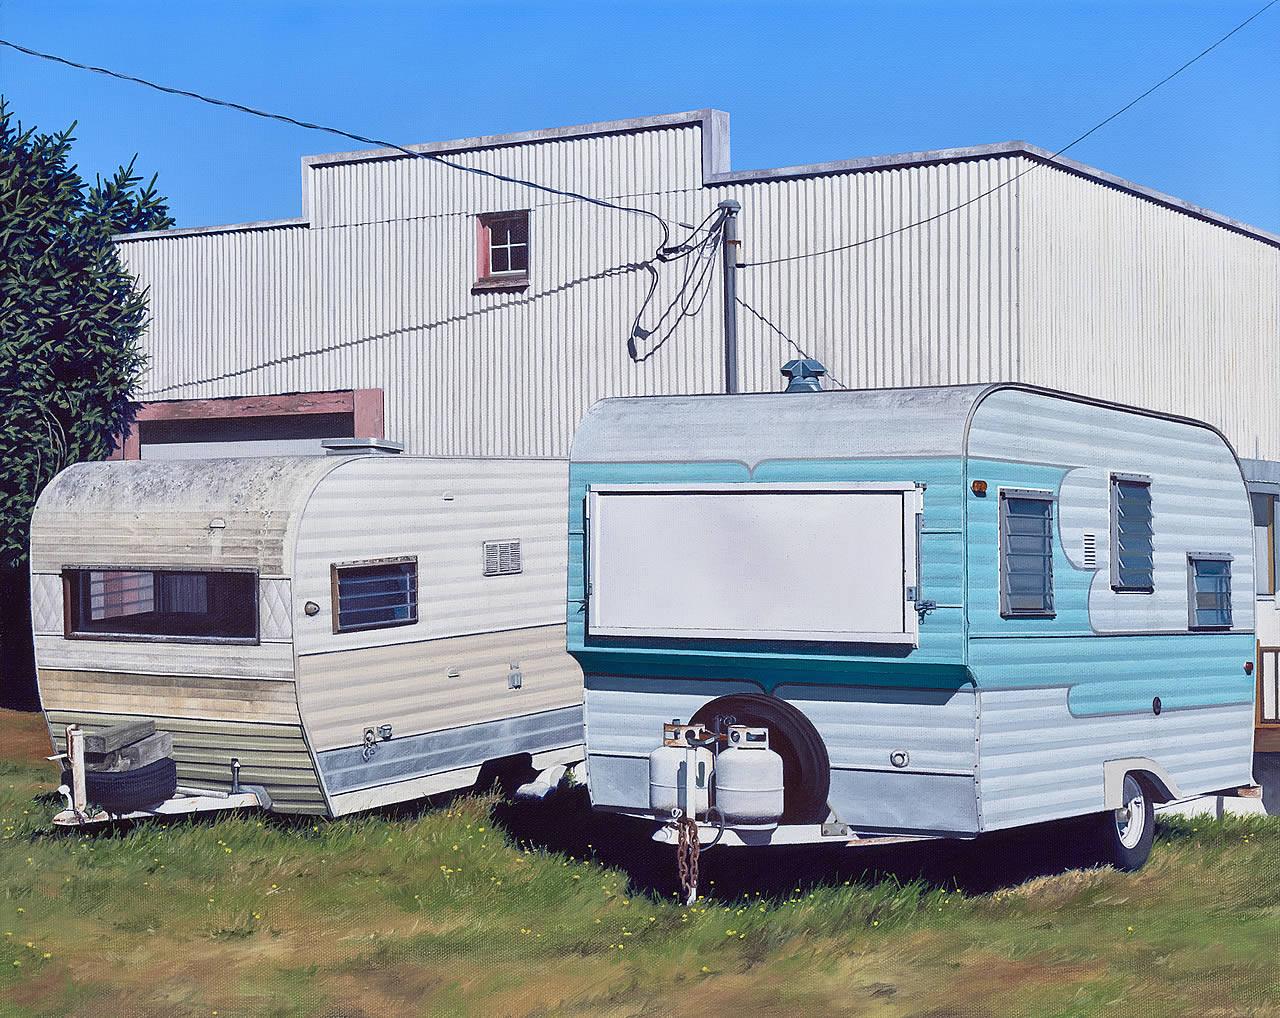 Old Friends (Port Townsend, WA)